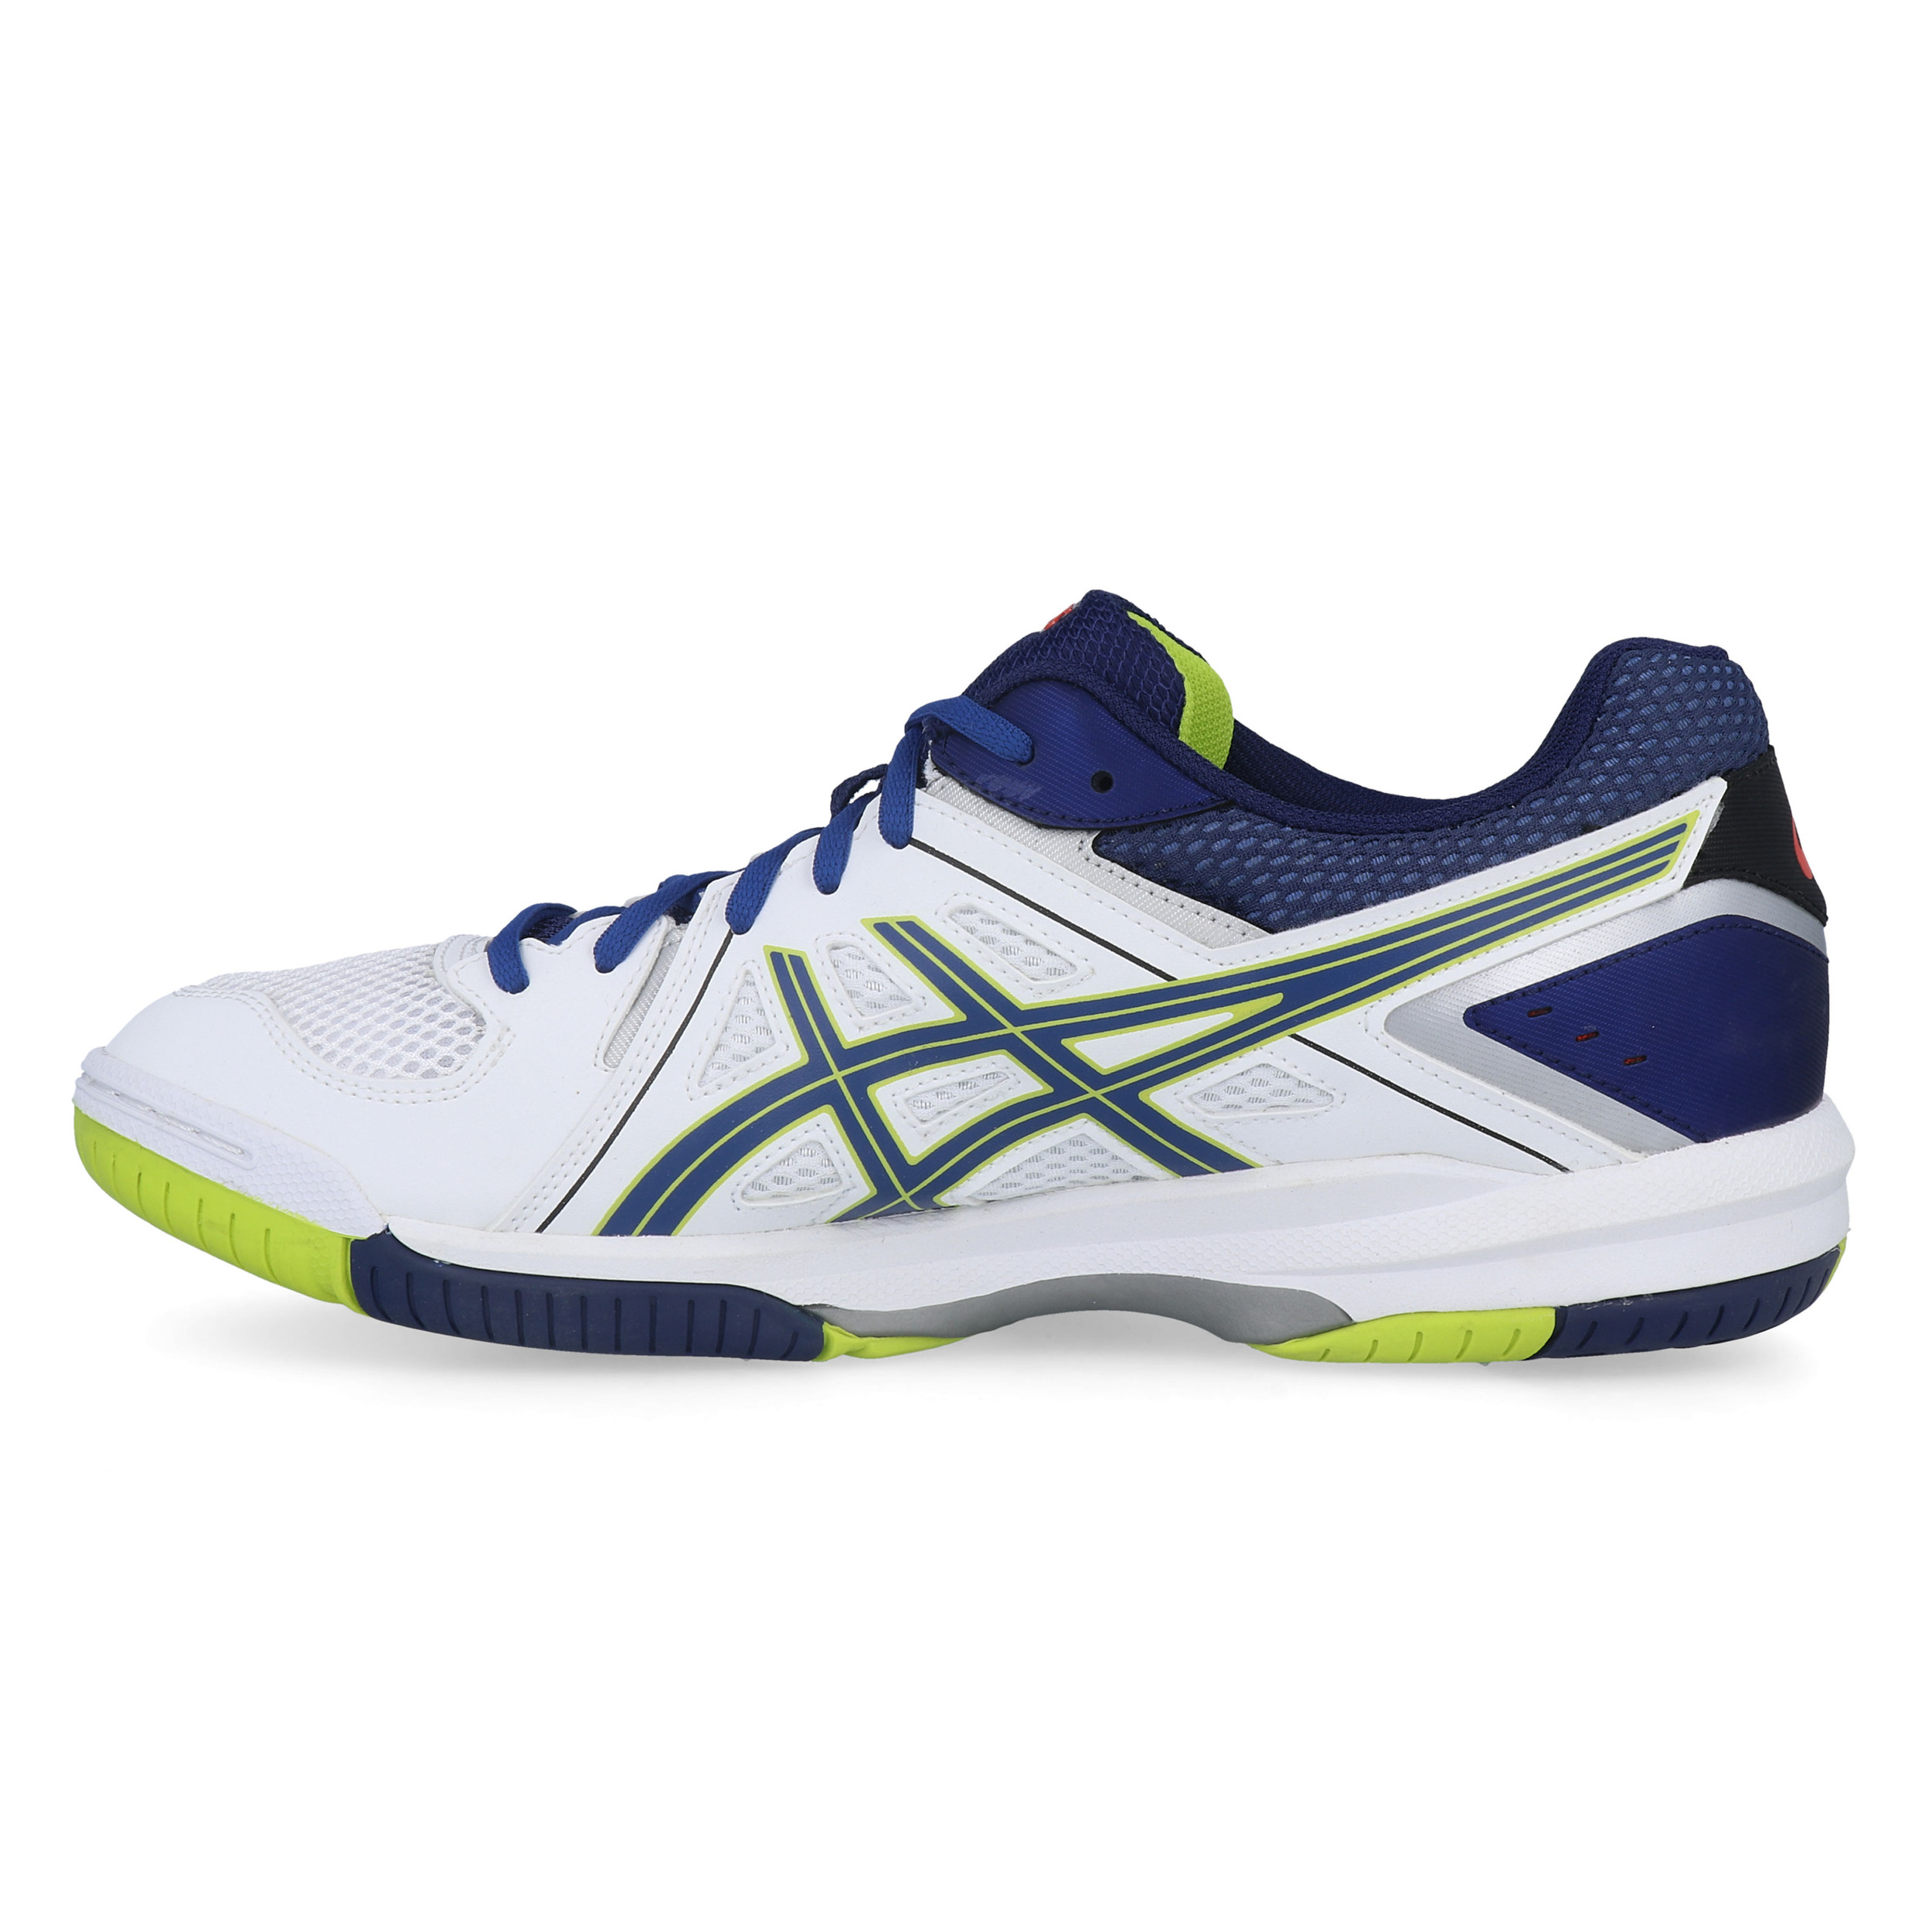 Asics Mens Gel-Task Indoor Court Shoes Blue White Yellow Sports Badminton Squash